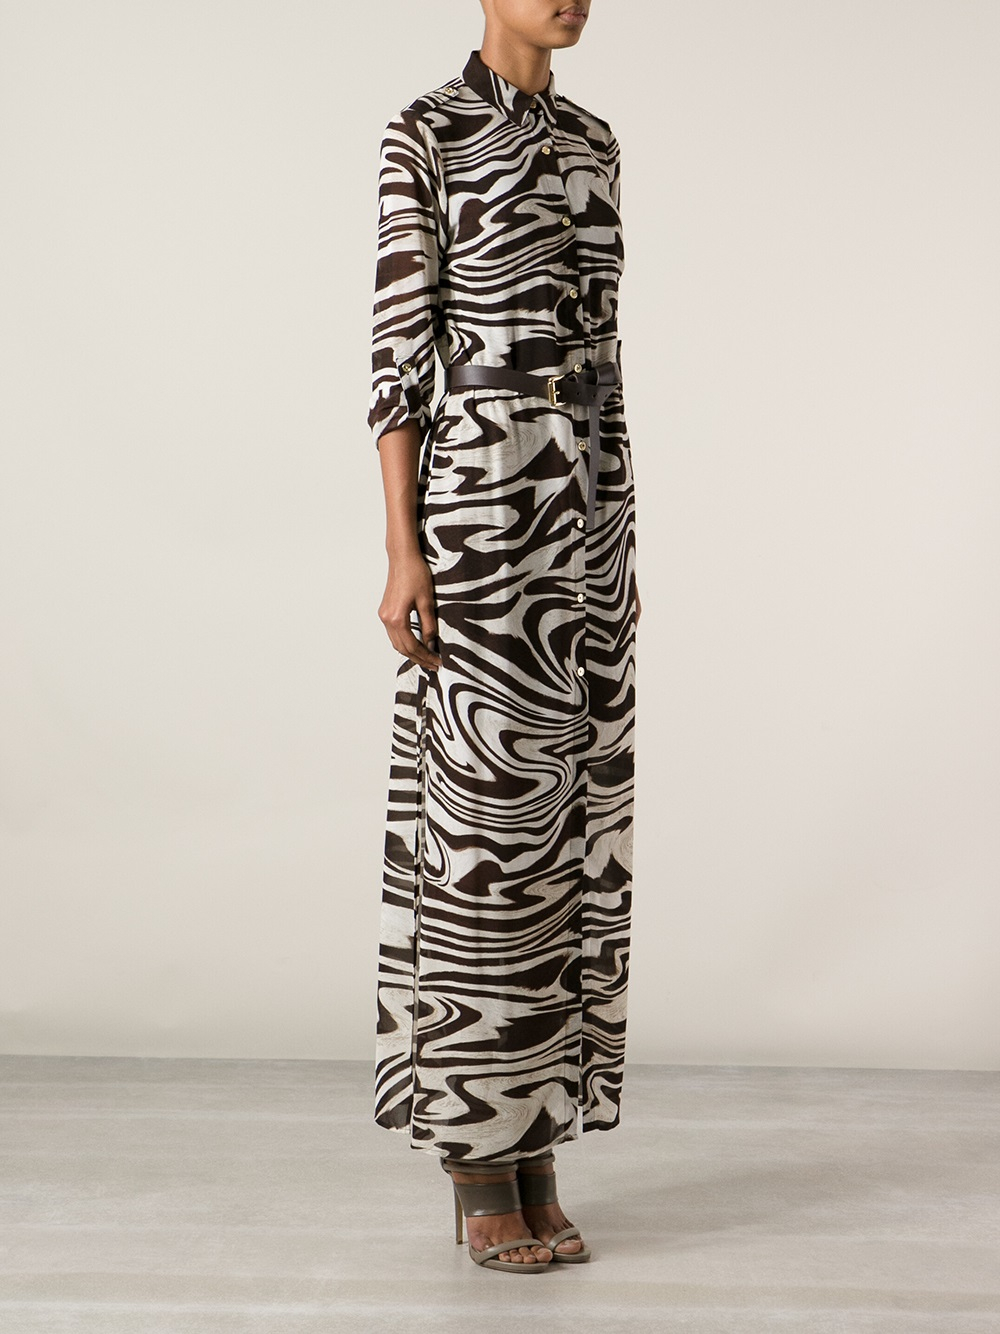 Michael Michael Kors Zebra Print Shirt Dress In Brown Lyst